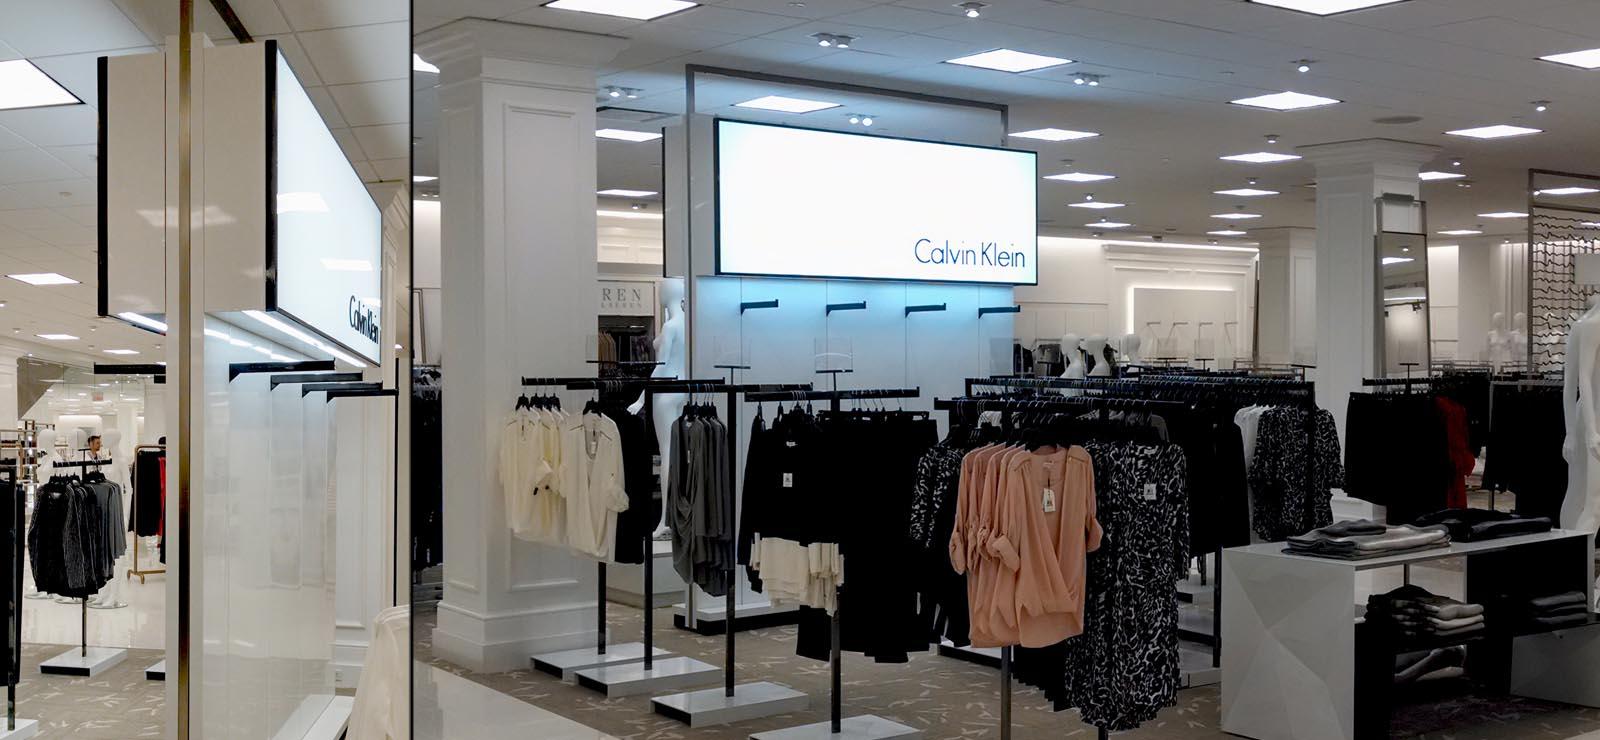 custom lighting fixtures, signage, retail industry, VDI Inc, New York